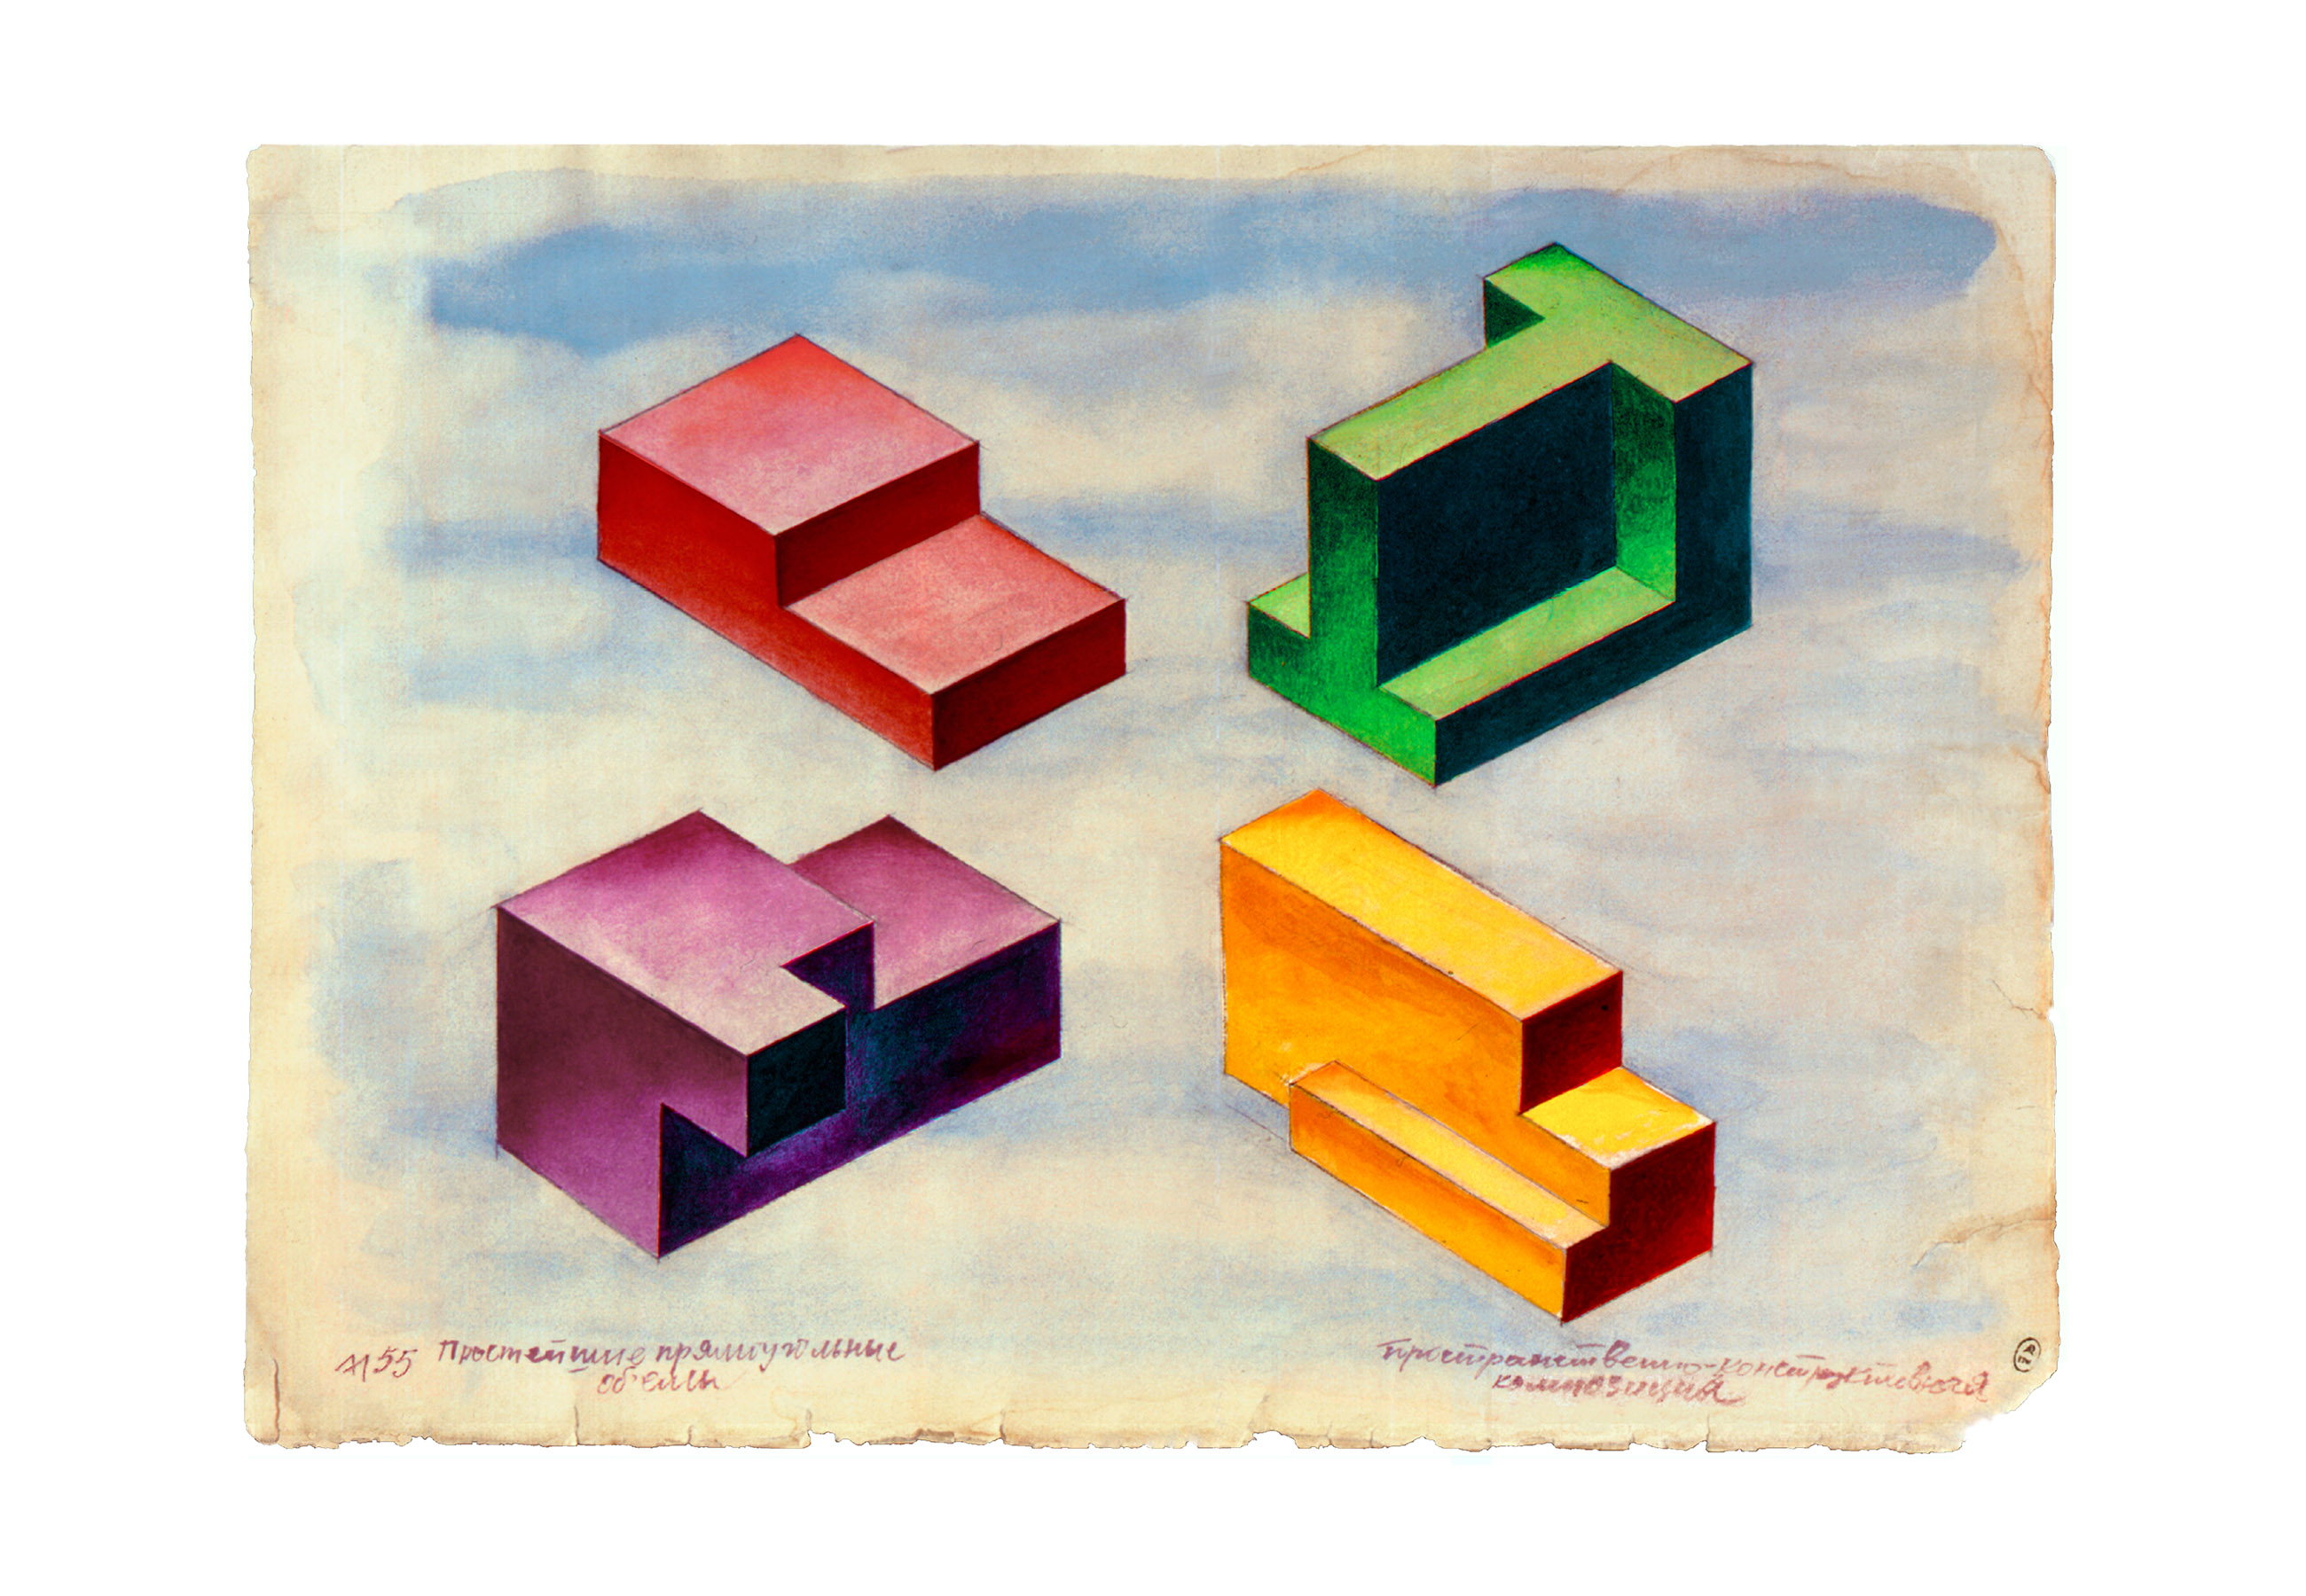 Lamm-Portfolio-1954-1955-31.jpg